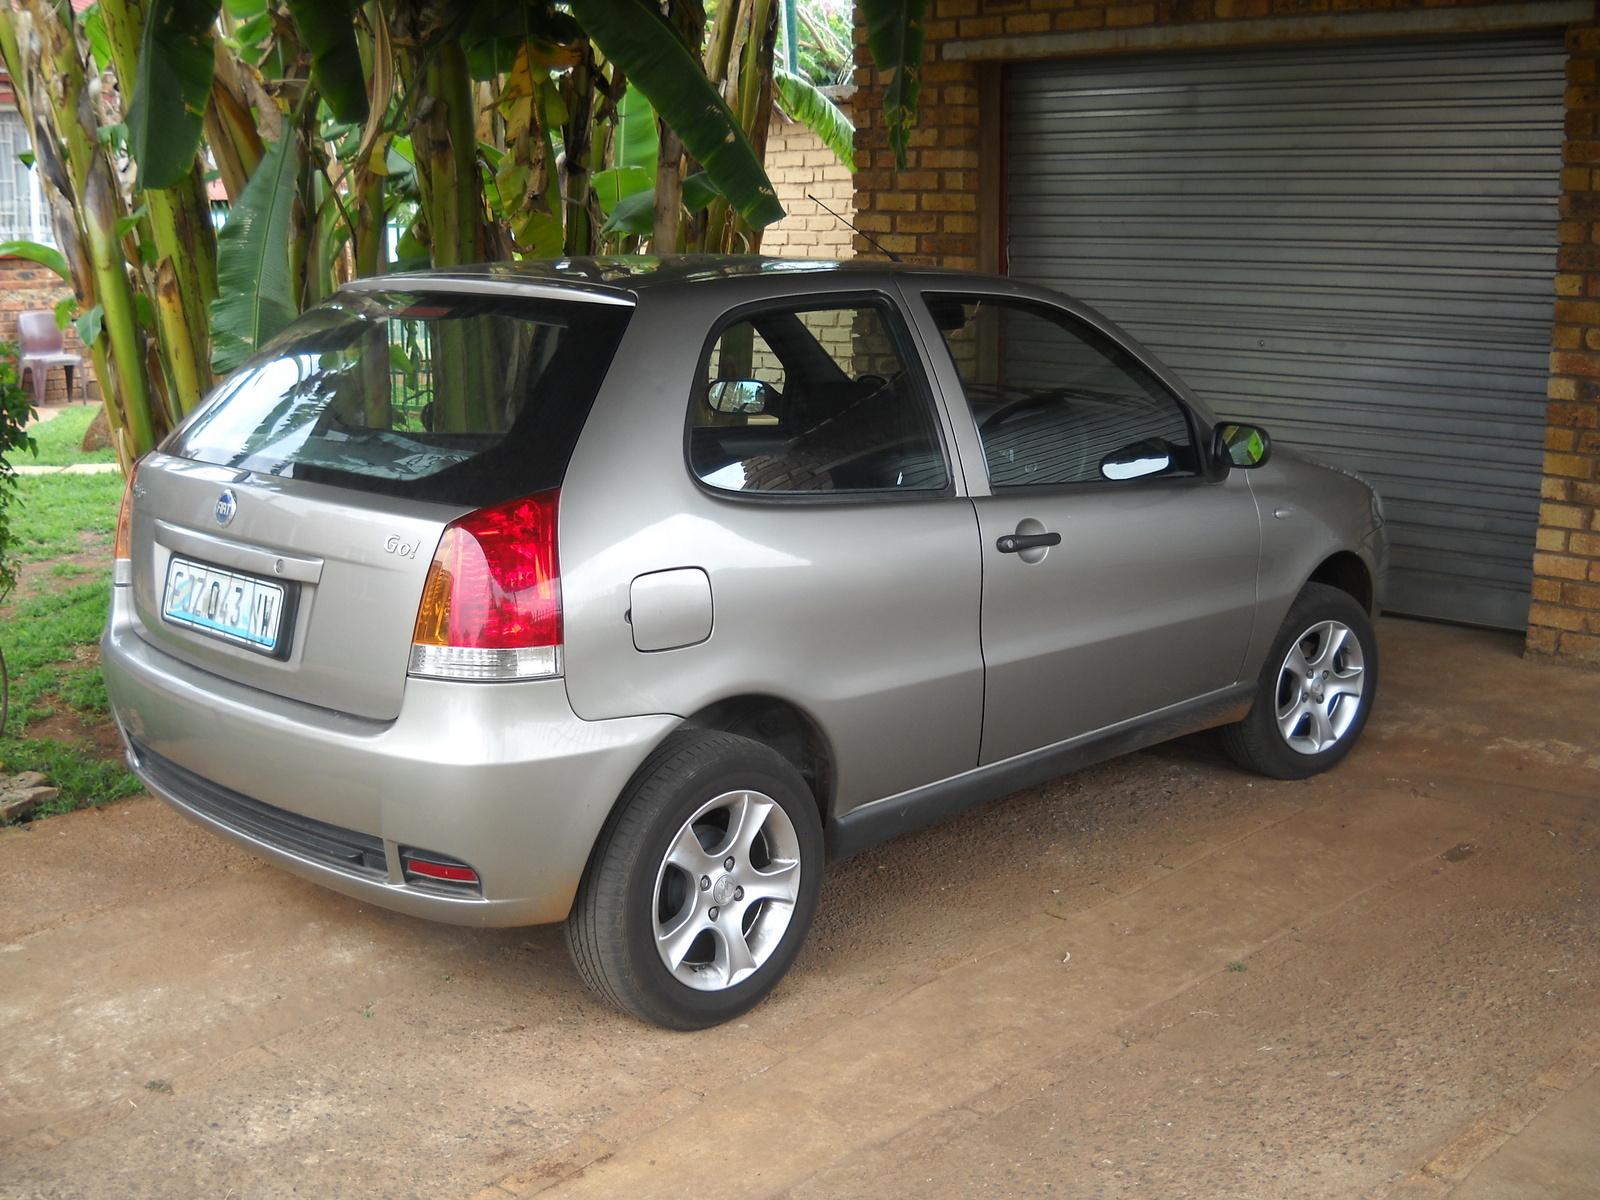 Subaru 0 Financing >> 2005 FIAT Palio - Overview - CarGurus